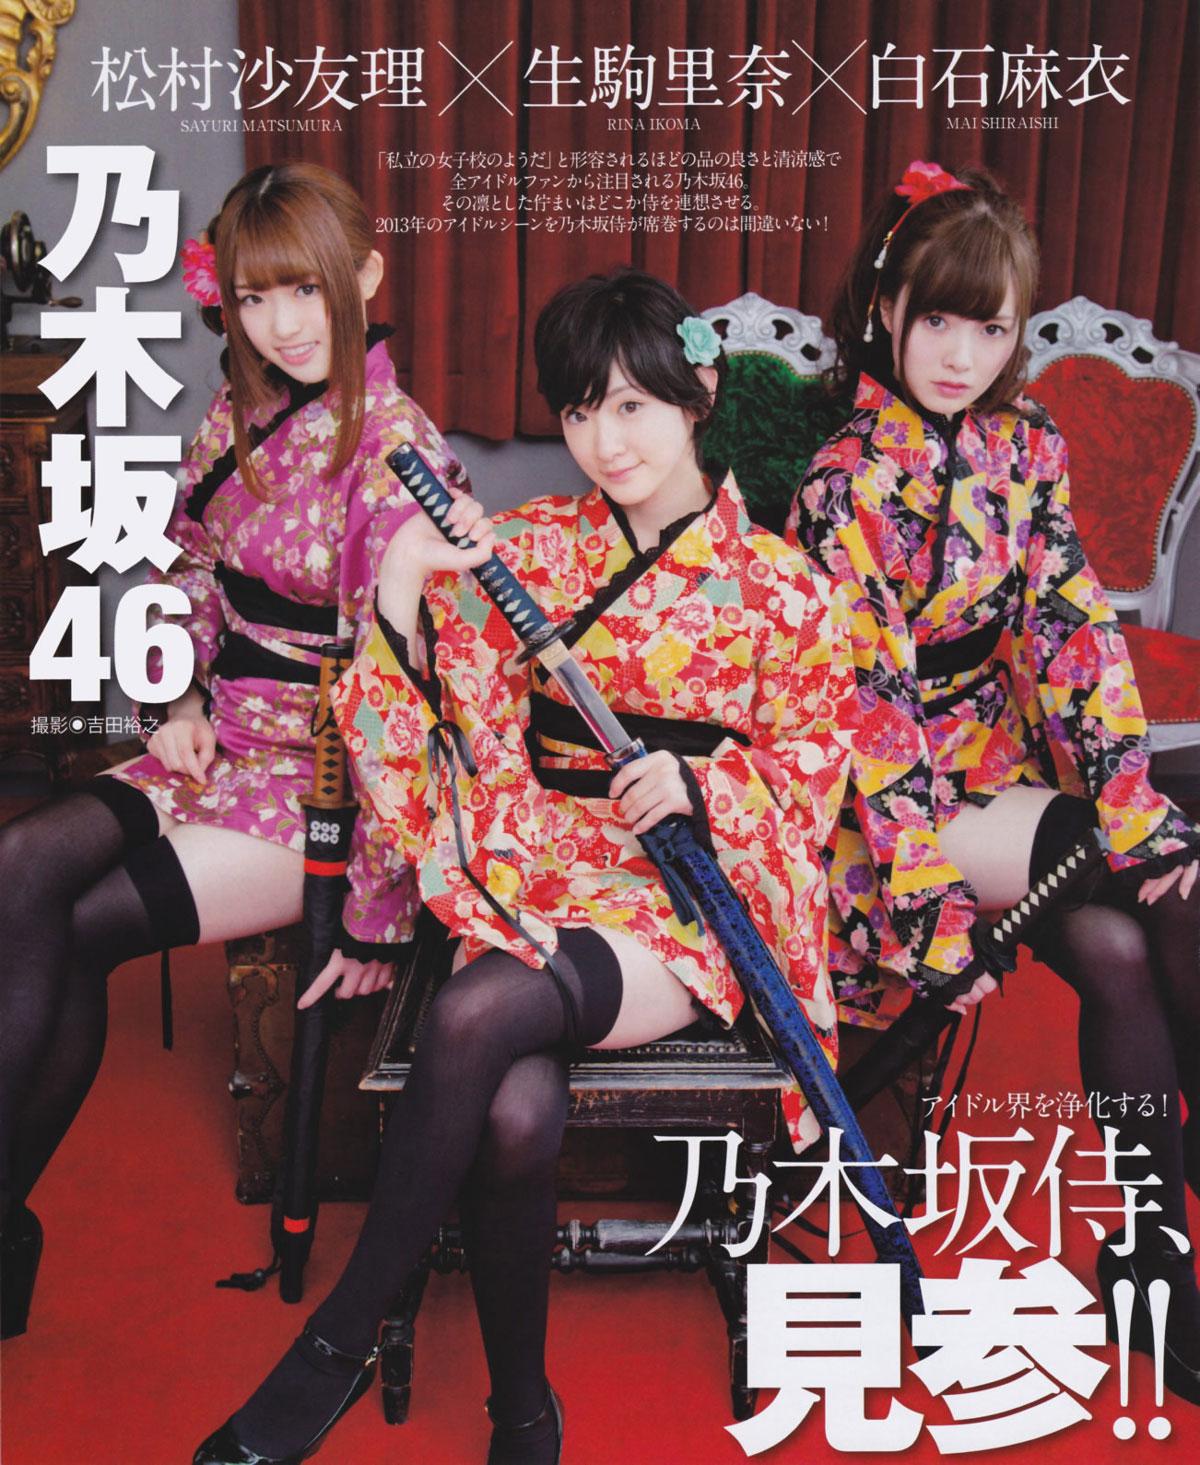 Nogizaka46 Japanese swordswoman cosplay